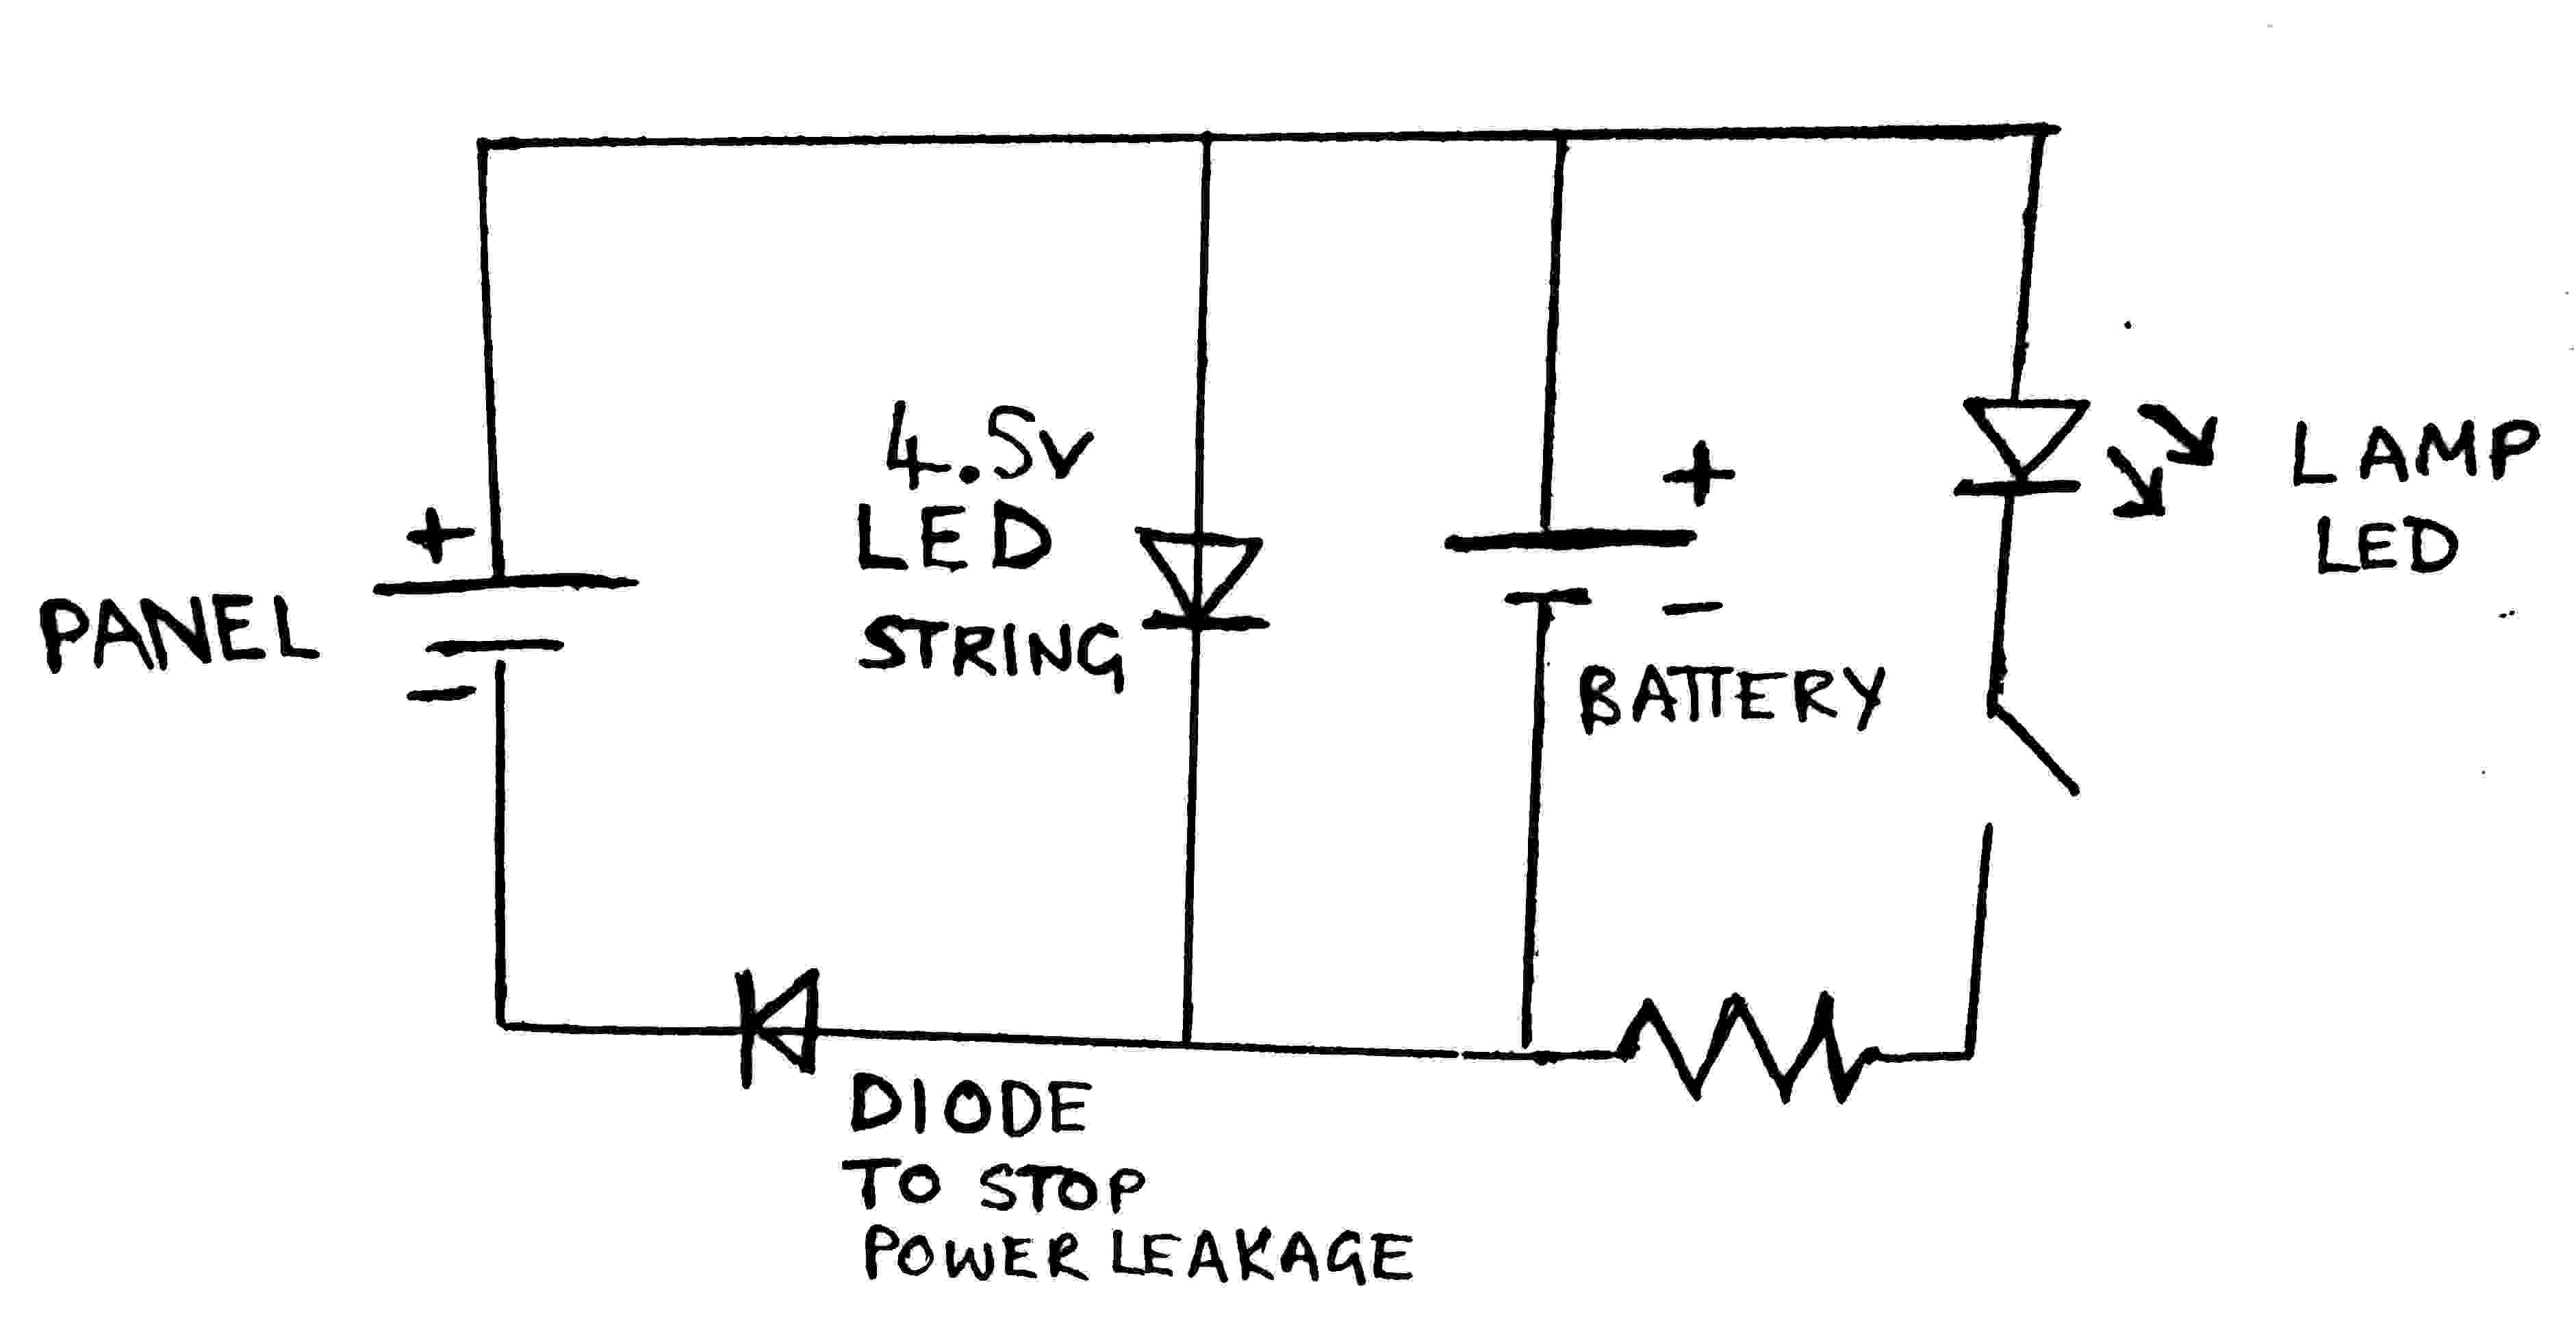 Solar Led Light Circuit Diagrams led Bulb Circuit Wiring Diagram Ponents